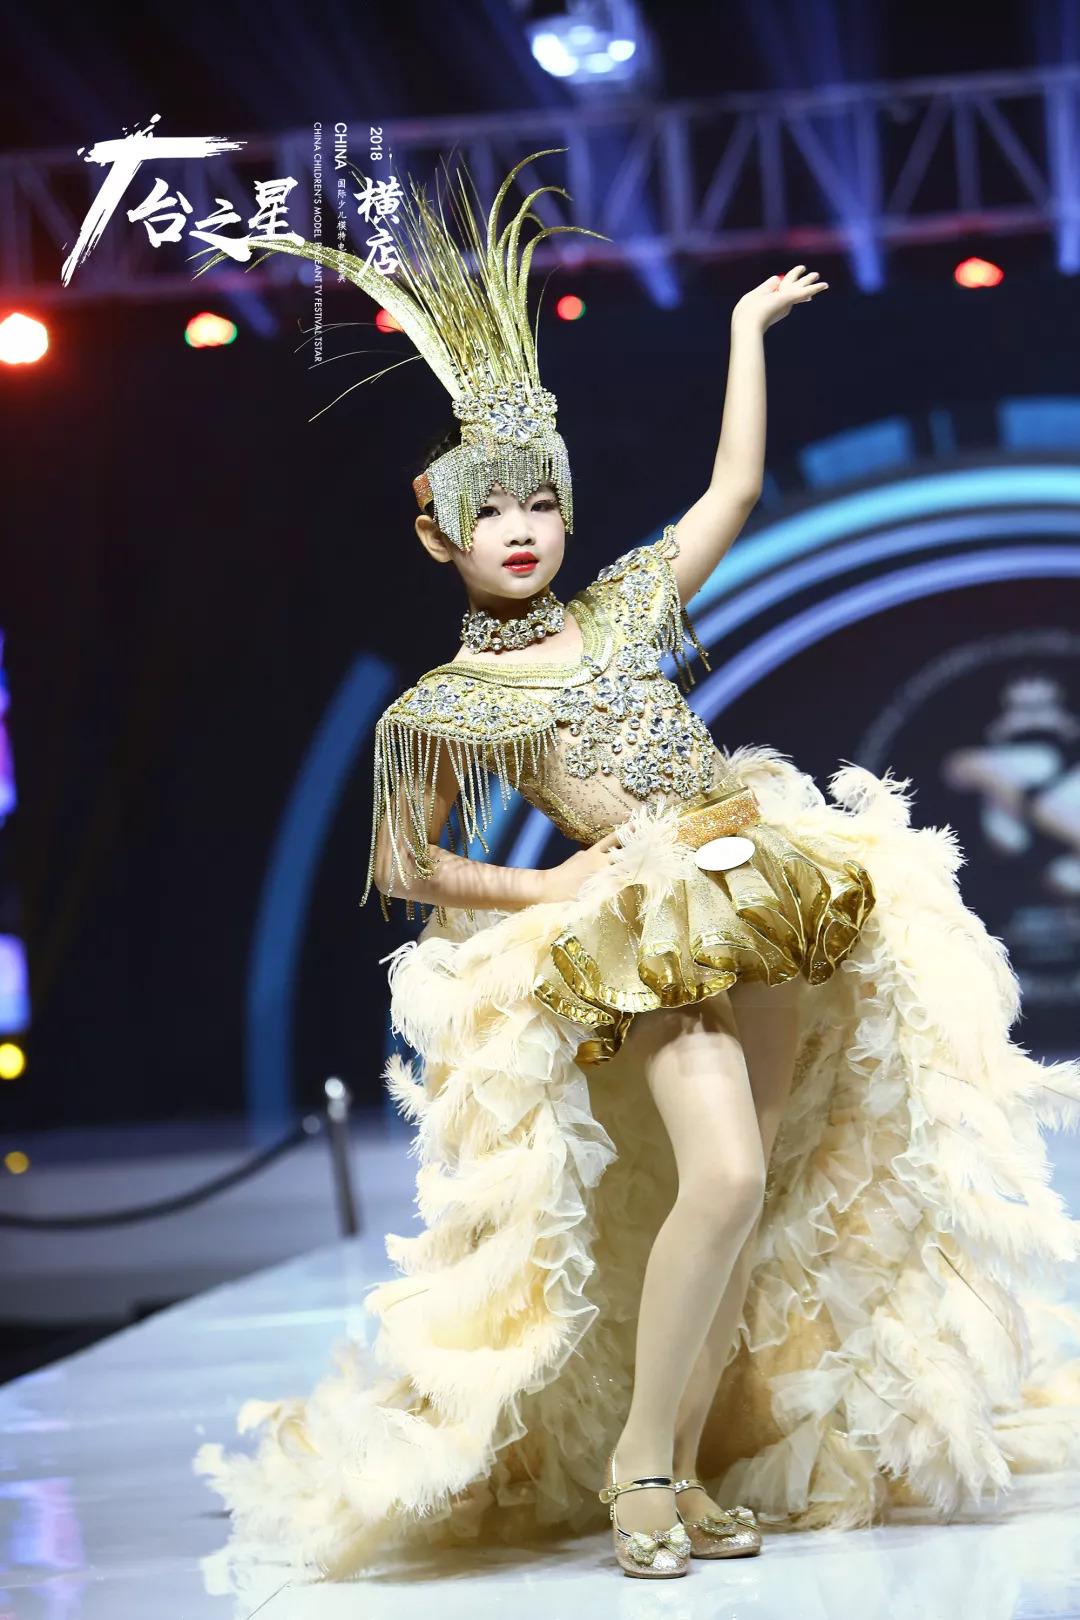 2018t台之星国际少儿模特电视盛典 c组>专题报道